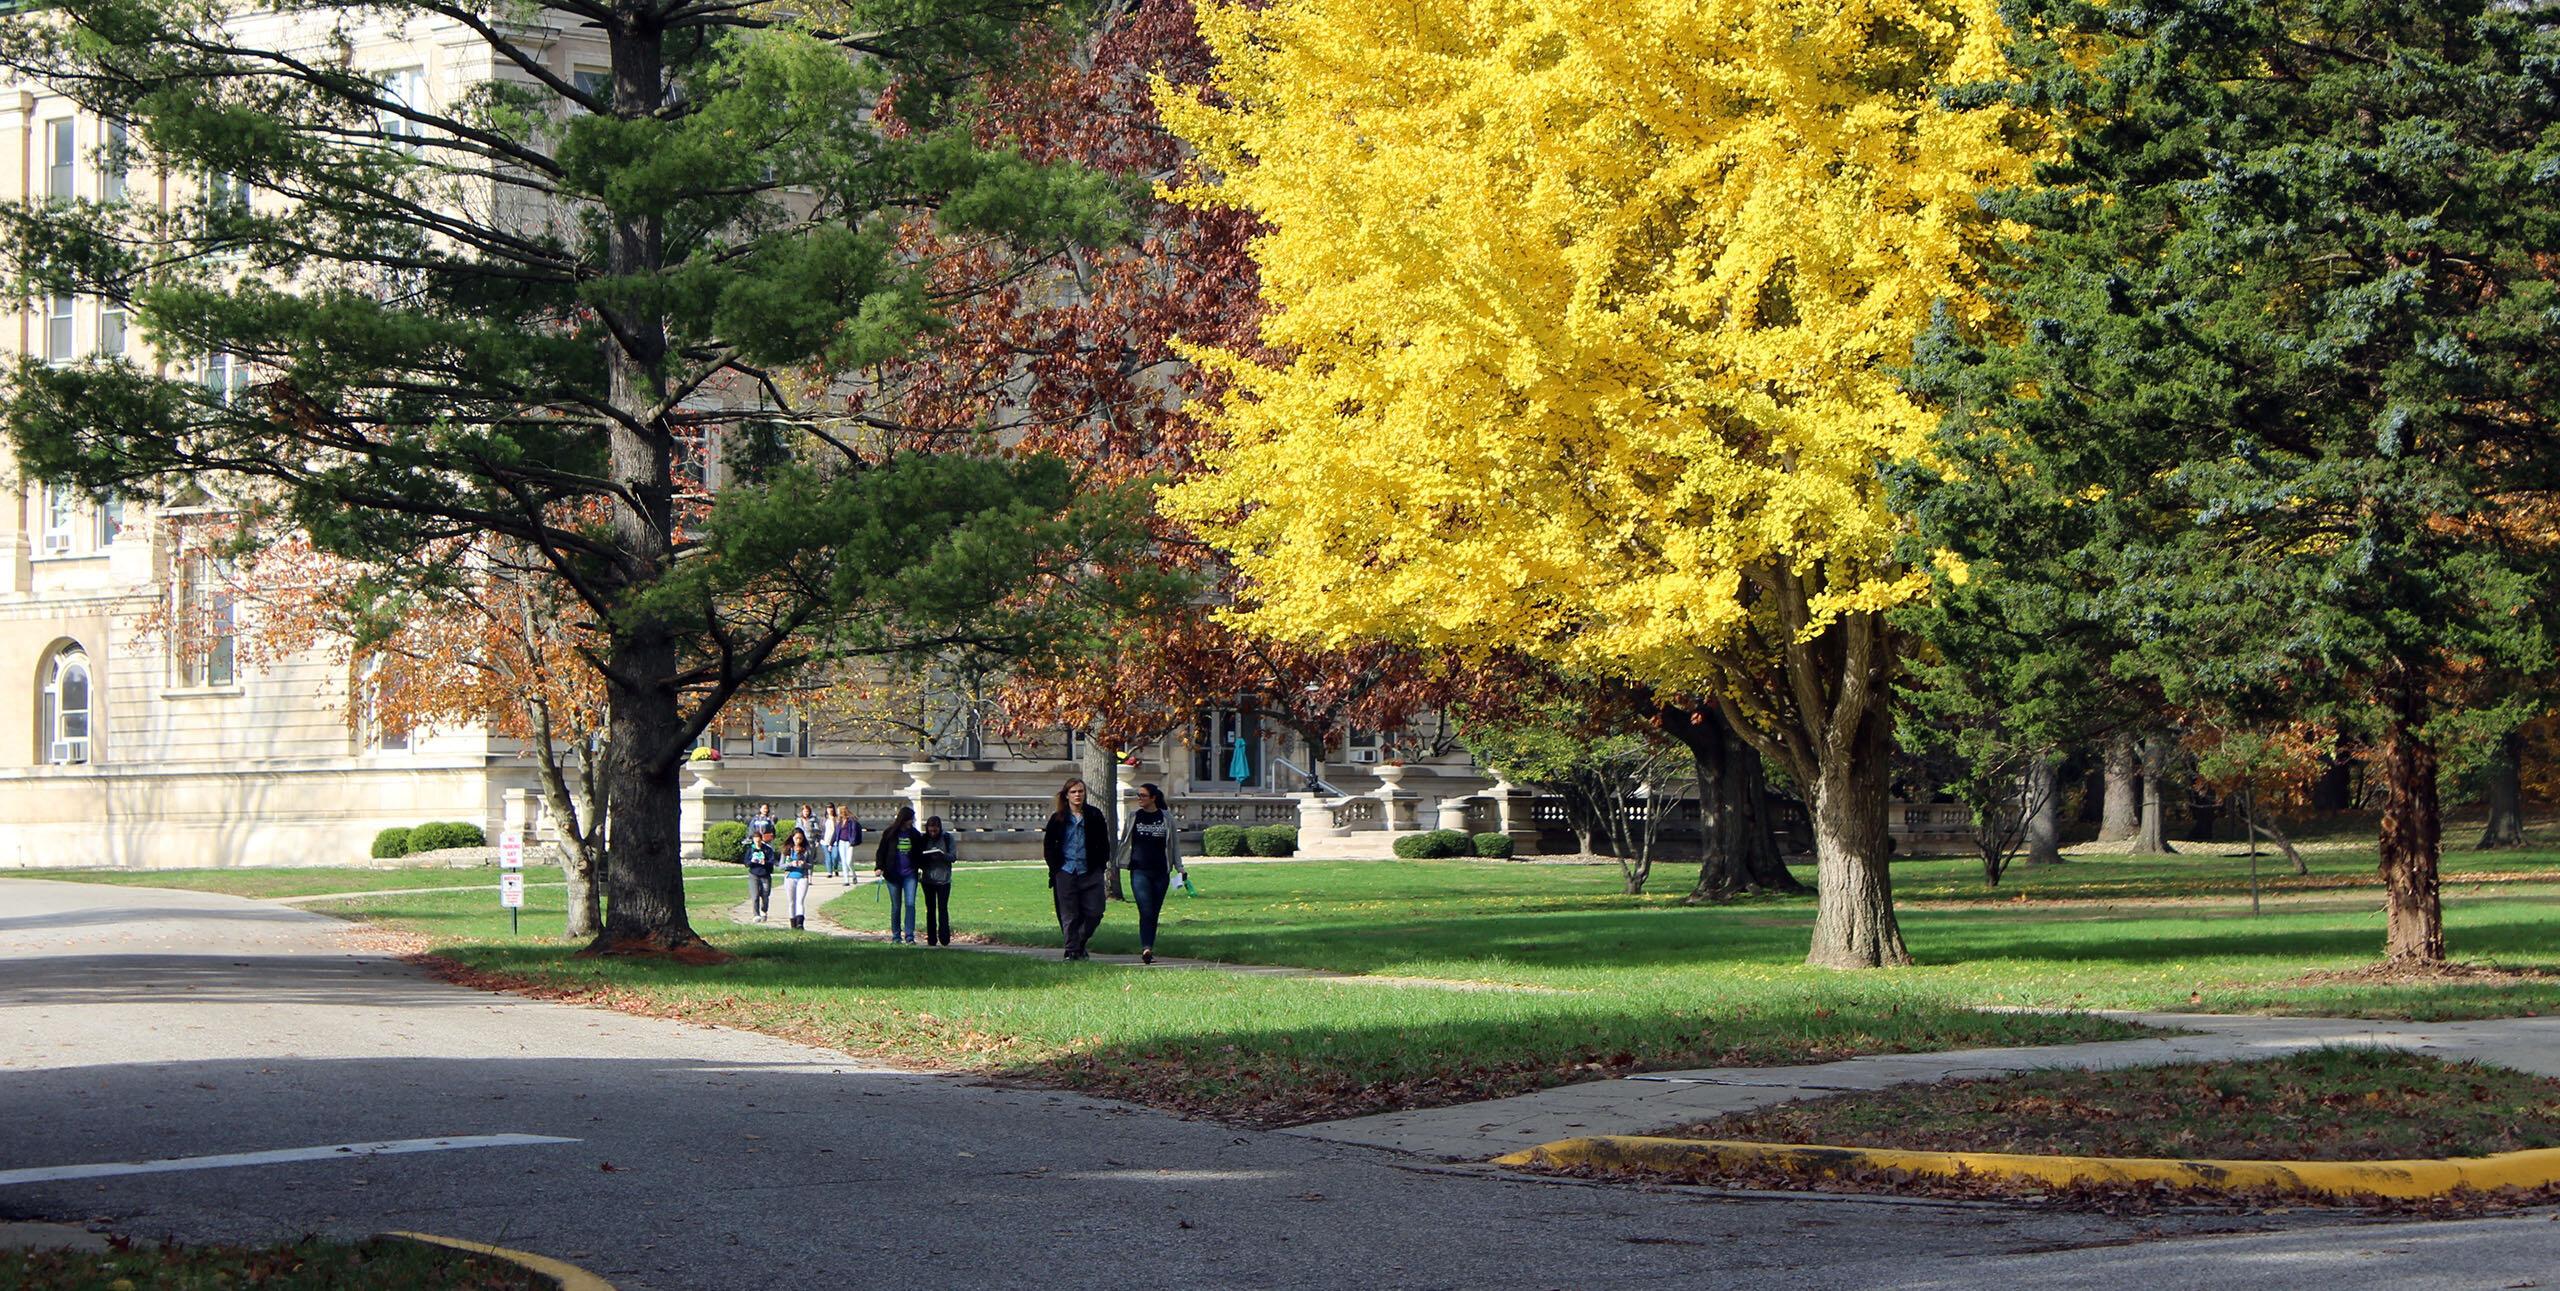 Students walking outside along sidewalk past fall colored trees